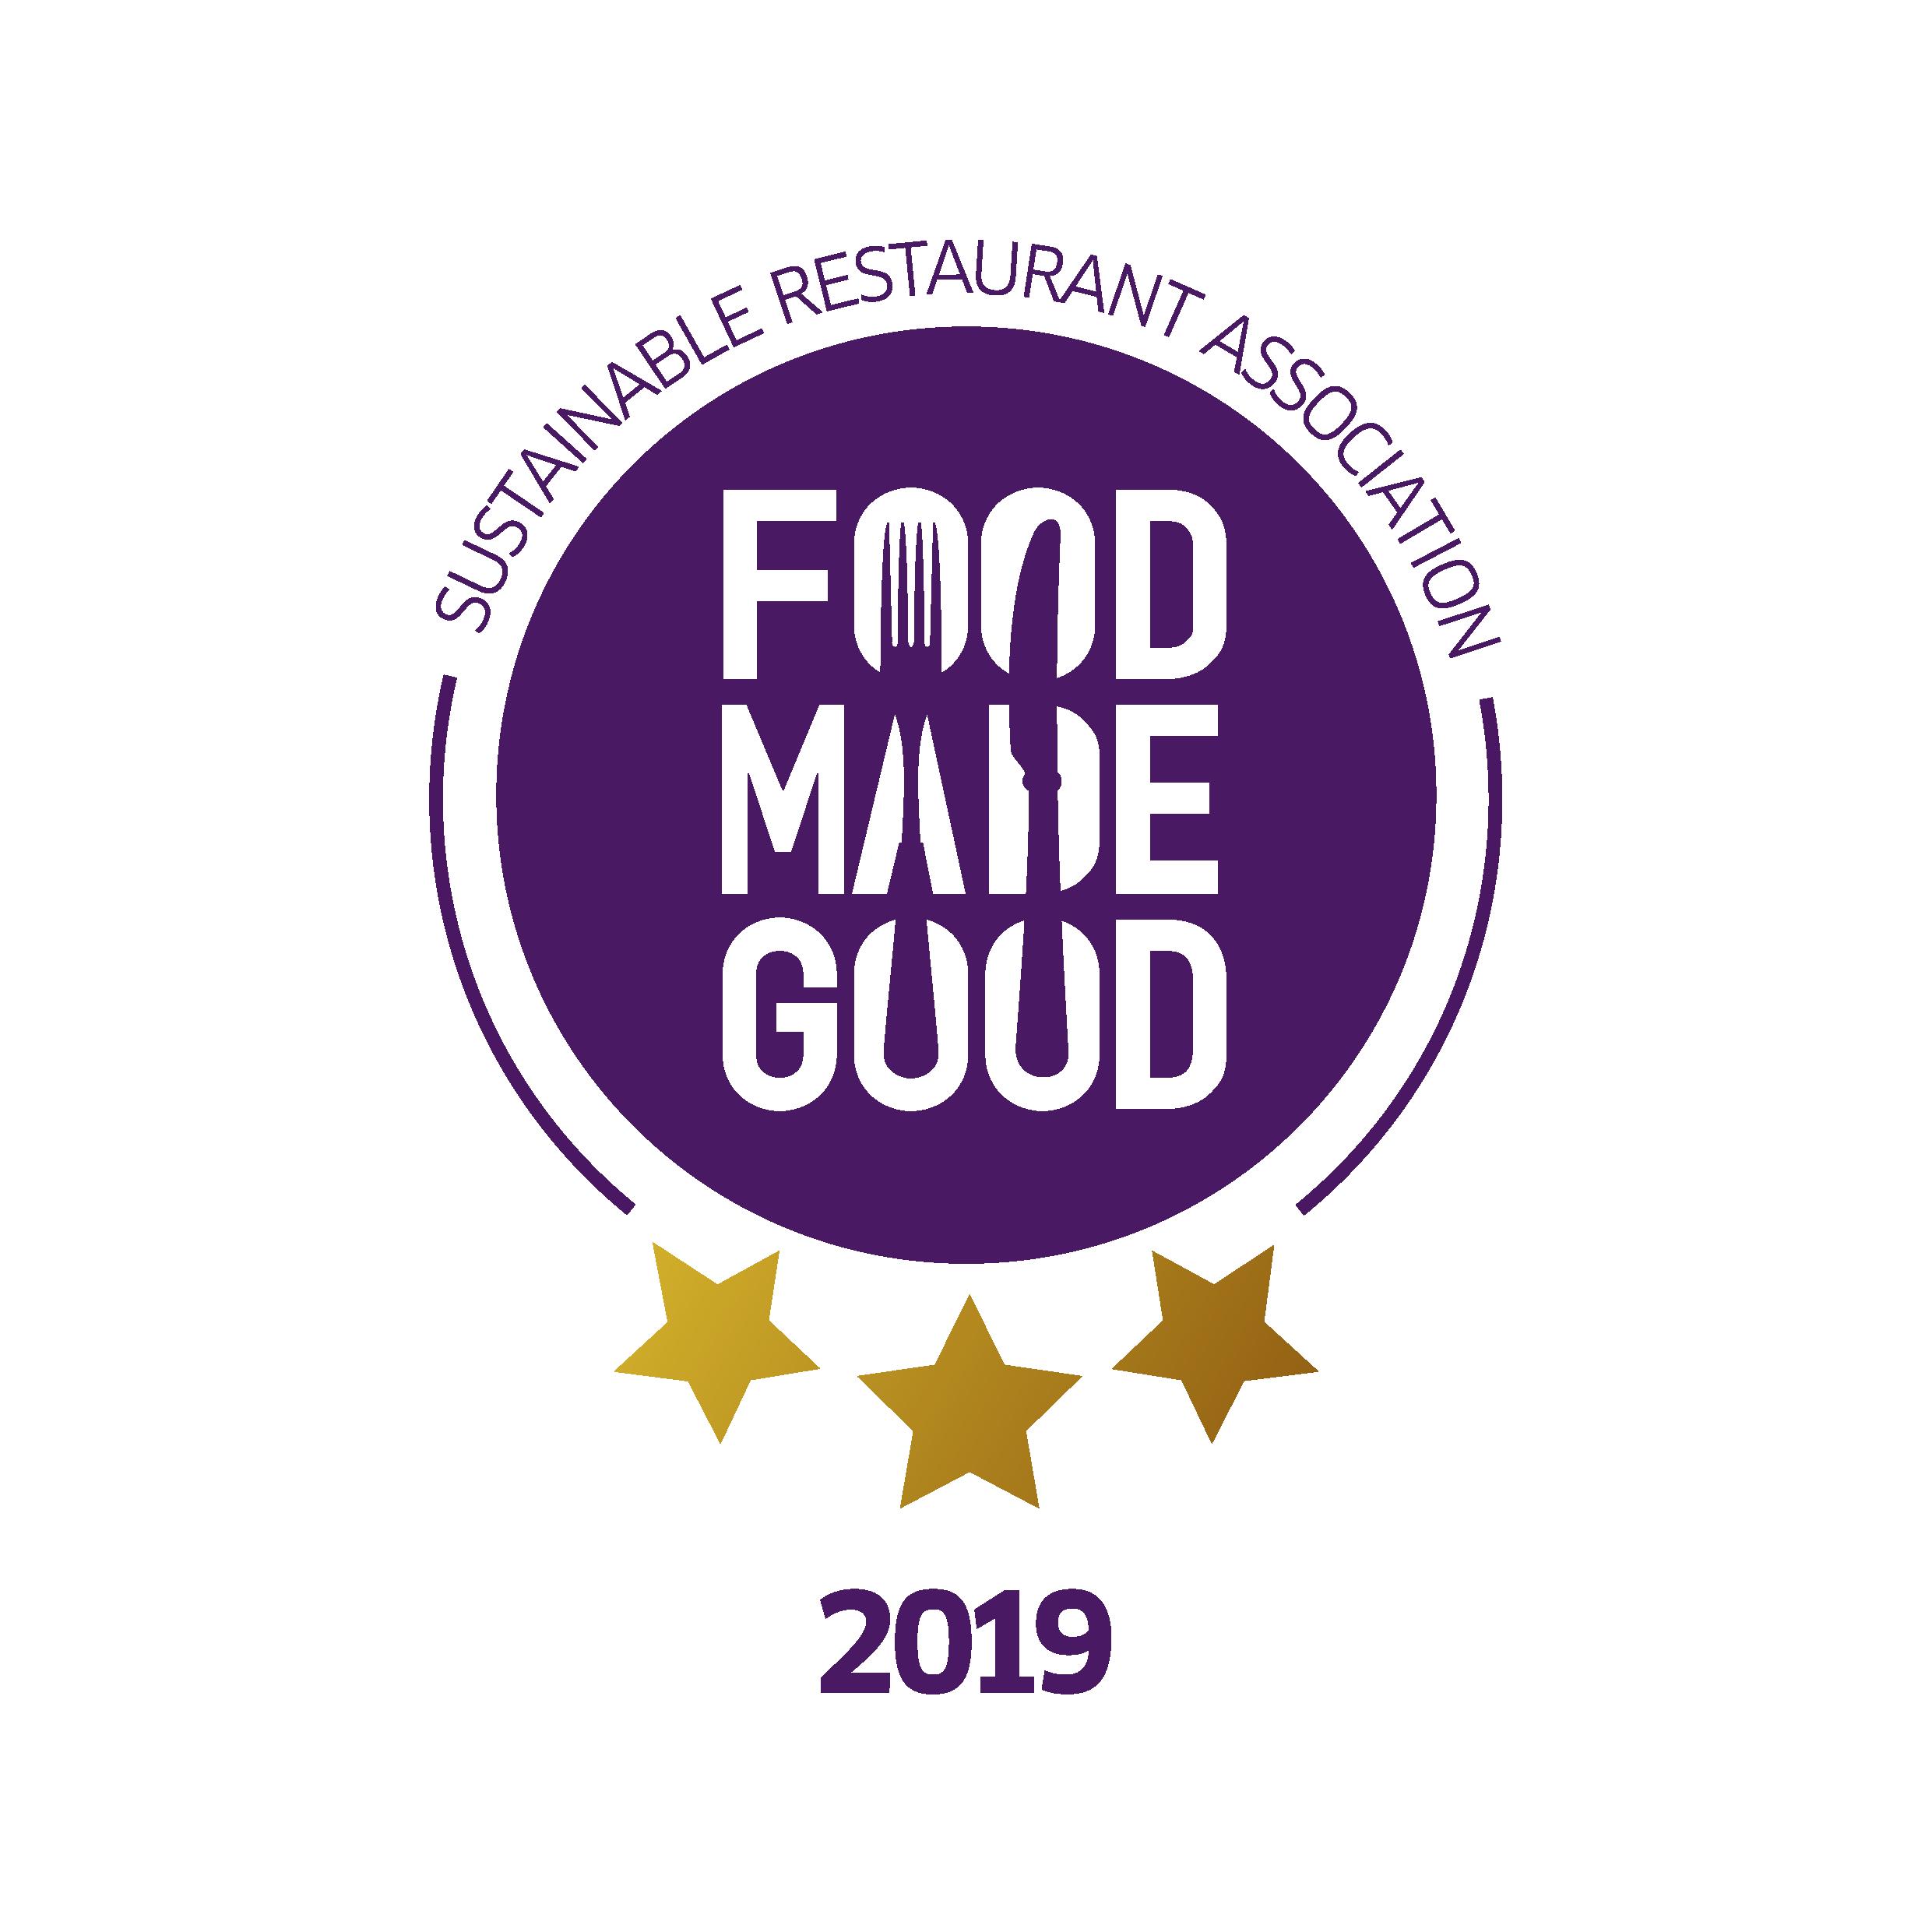 Fooditude - Fooditude achieve 3 stars rating